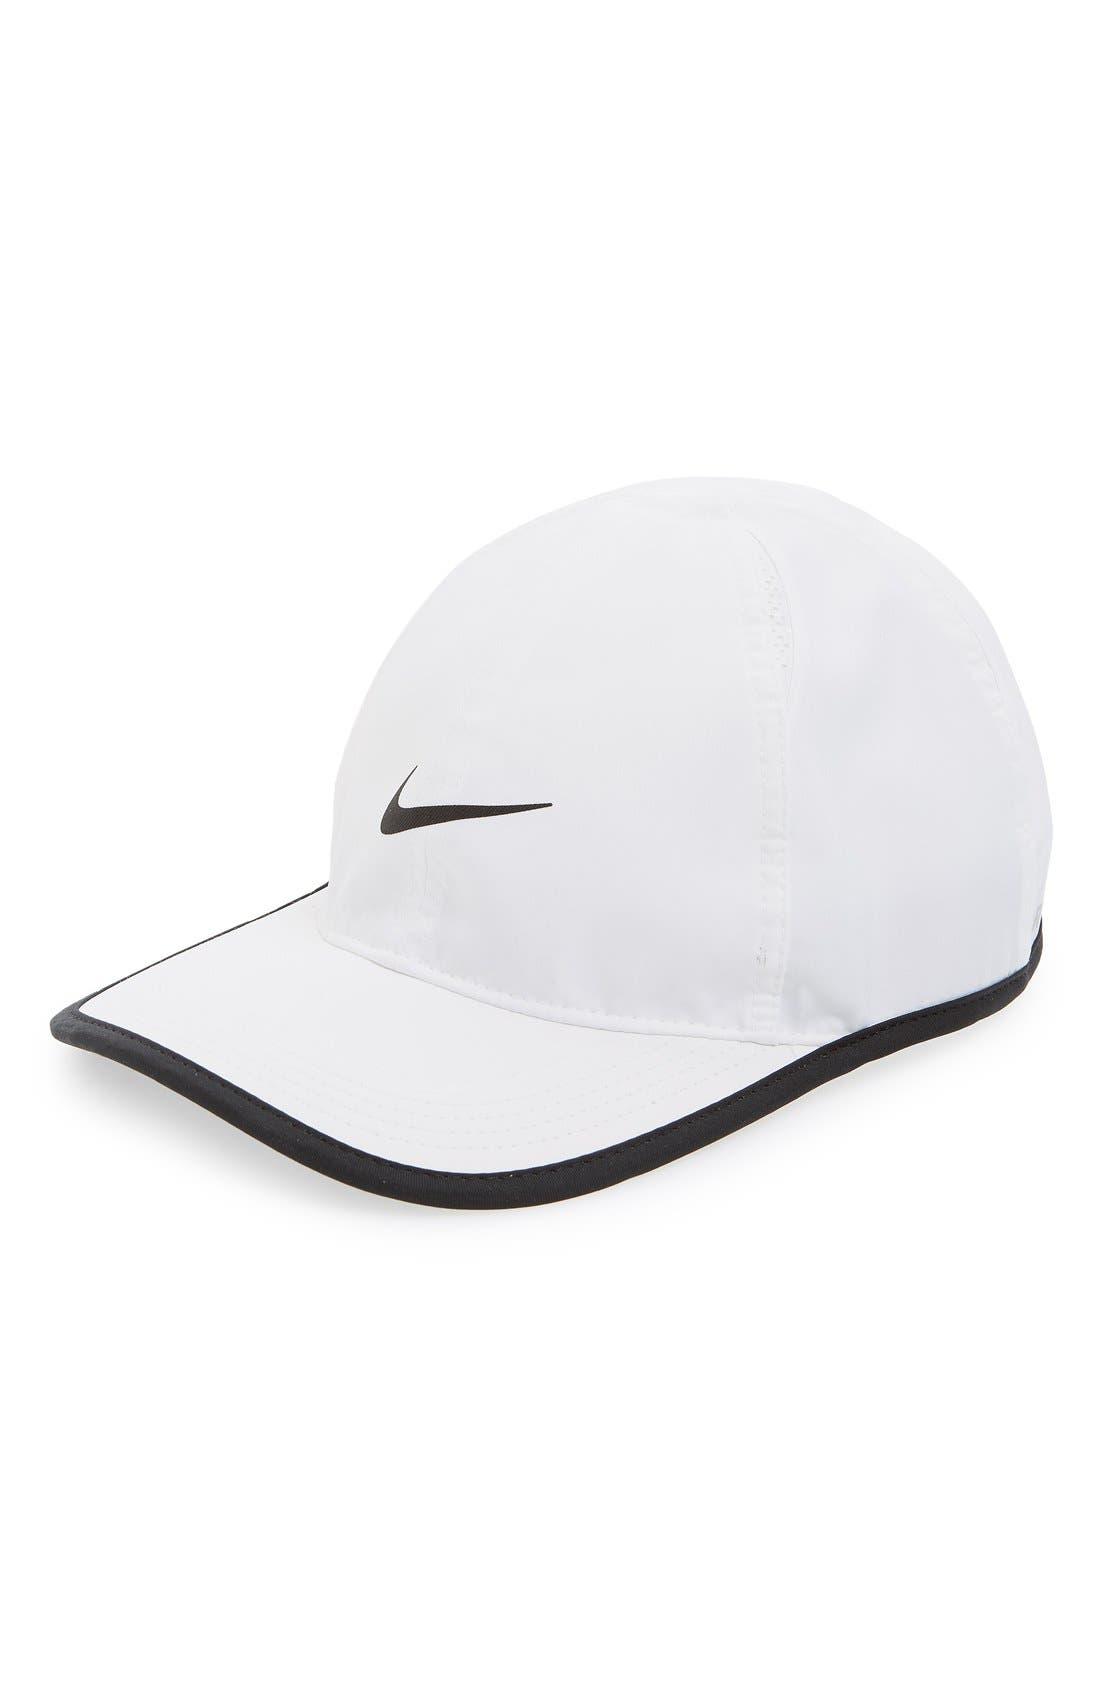 Nike 'Featherlight' Baseball Cap